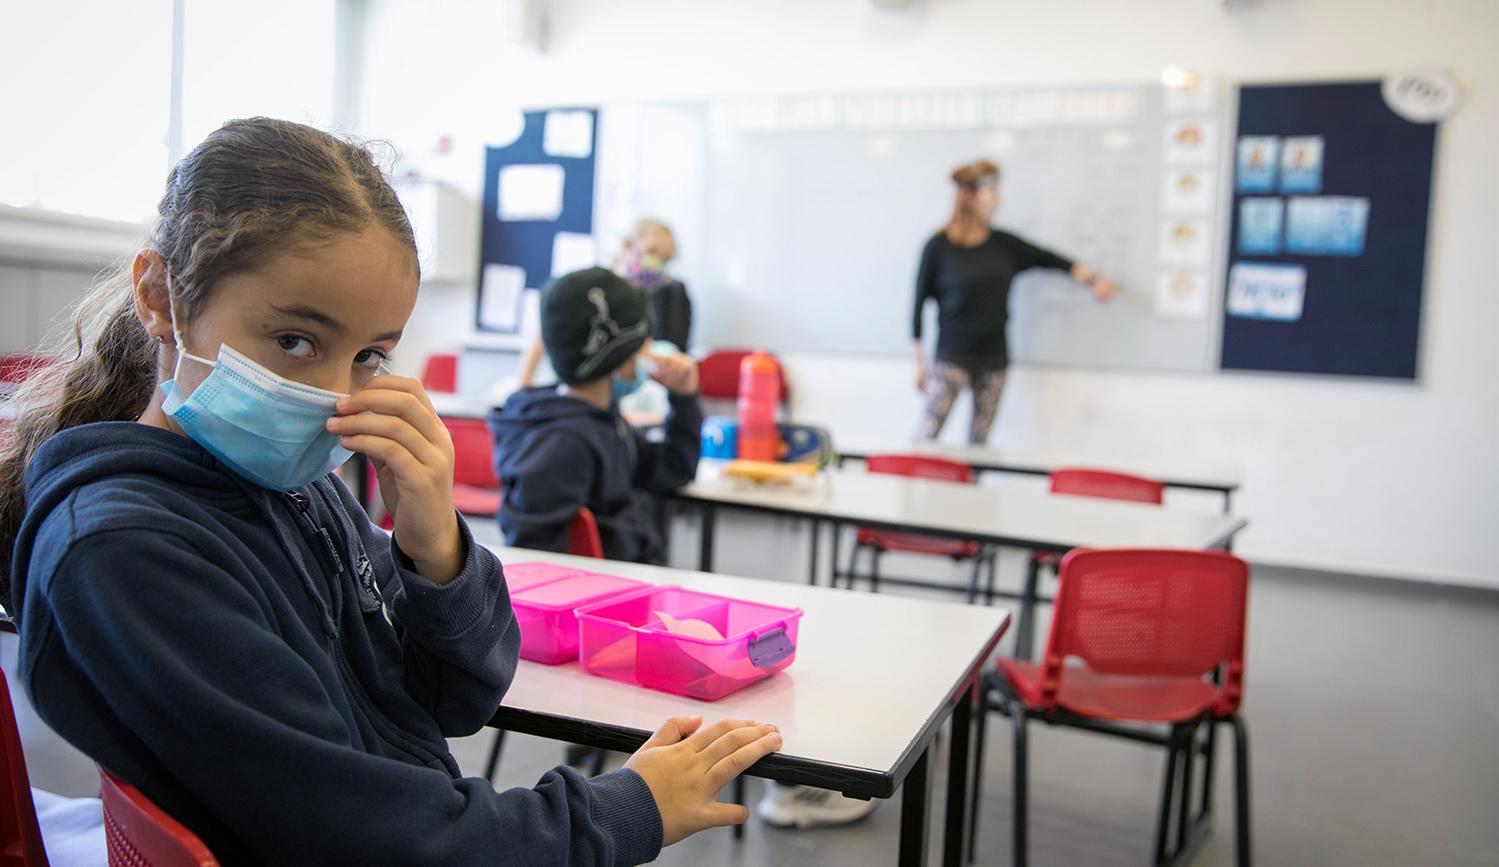 The Jewish Schools of the Future